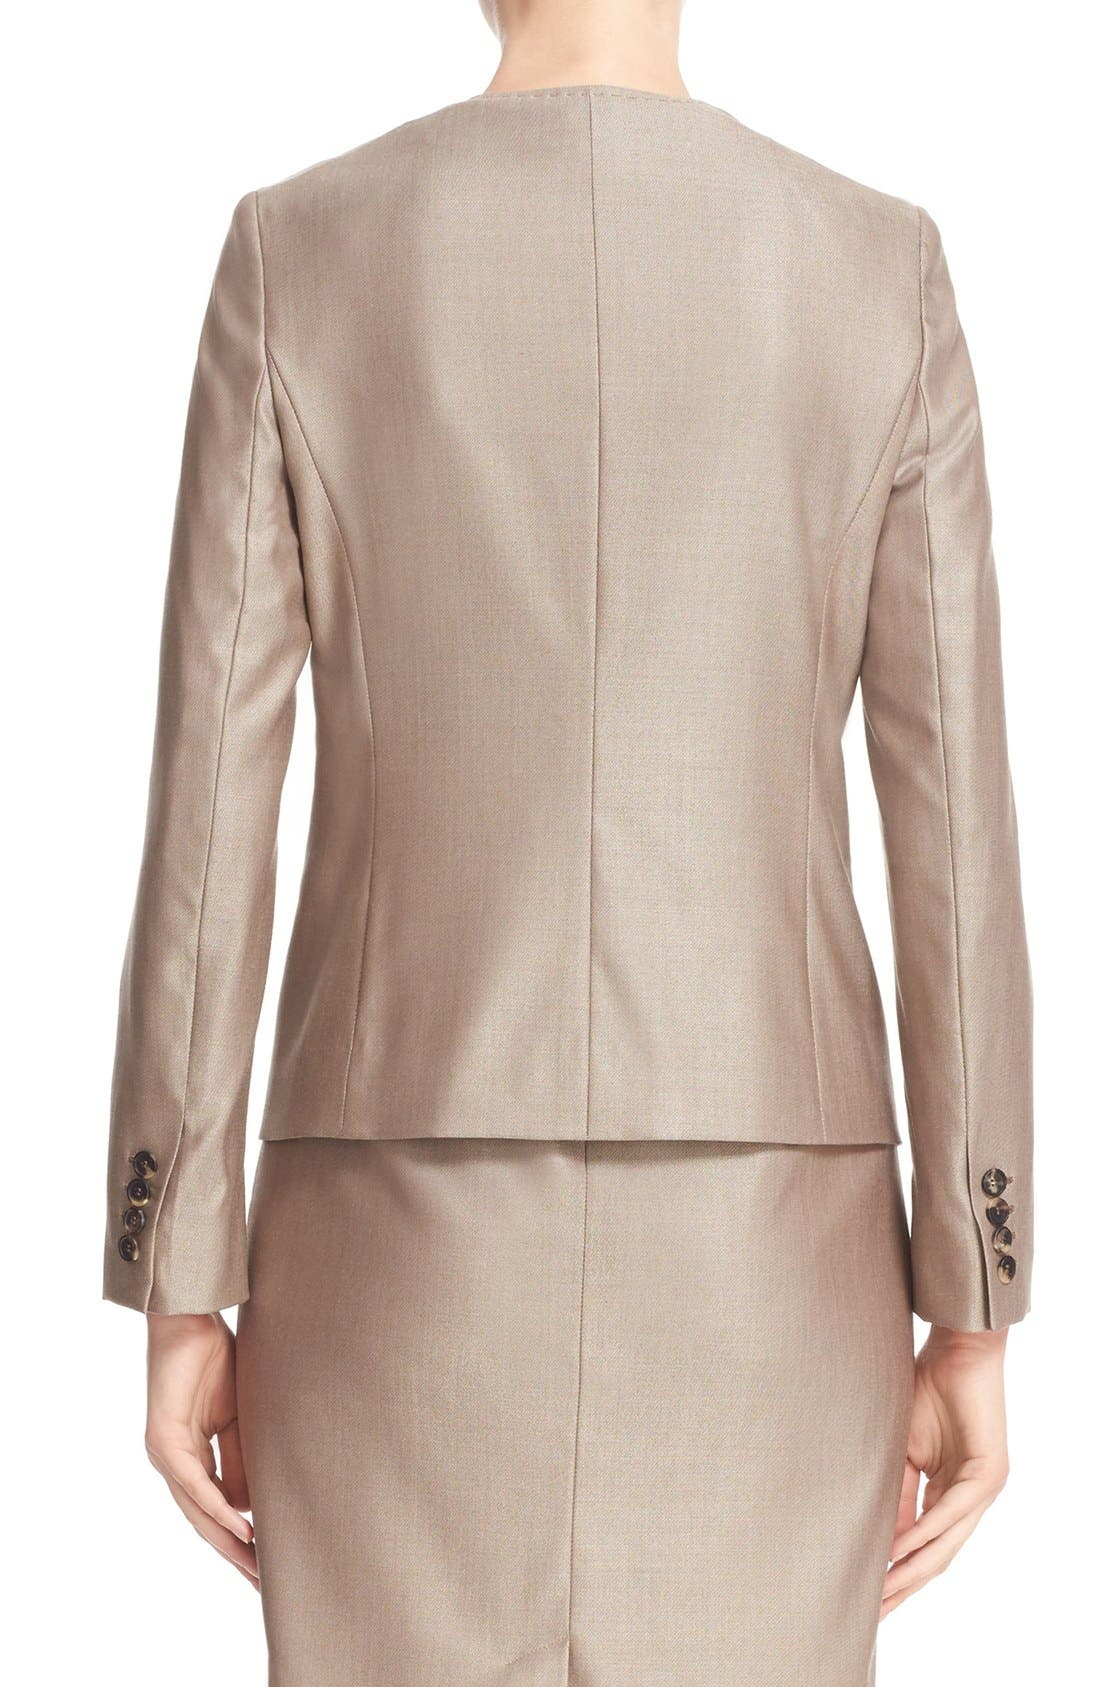 Erba Asymmetrical Jacket,                             Alternate thumbnail 8, color,                             220